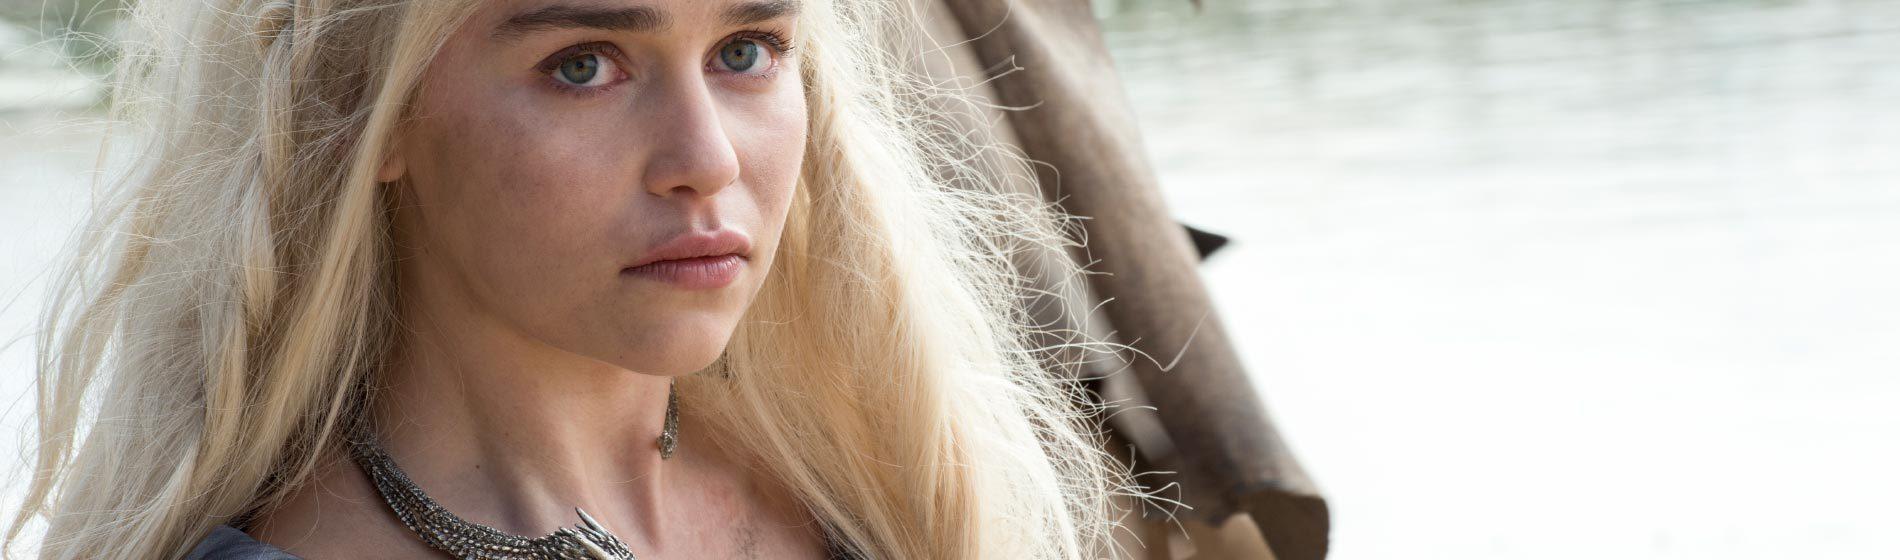 Game of Thrones Season 6 Episode 1 Recap - That Shelf